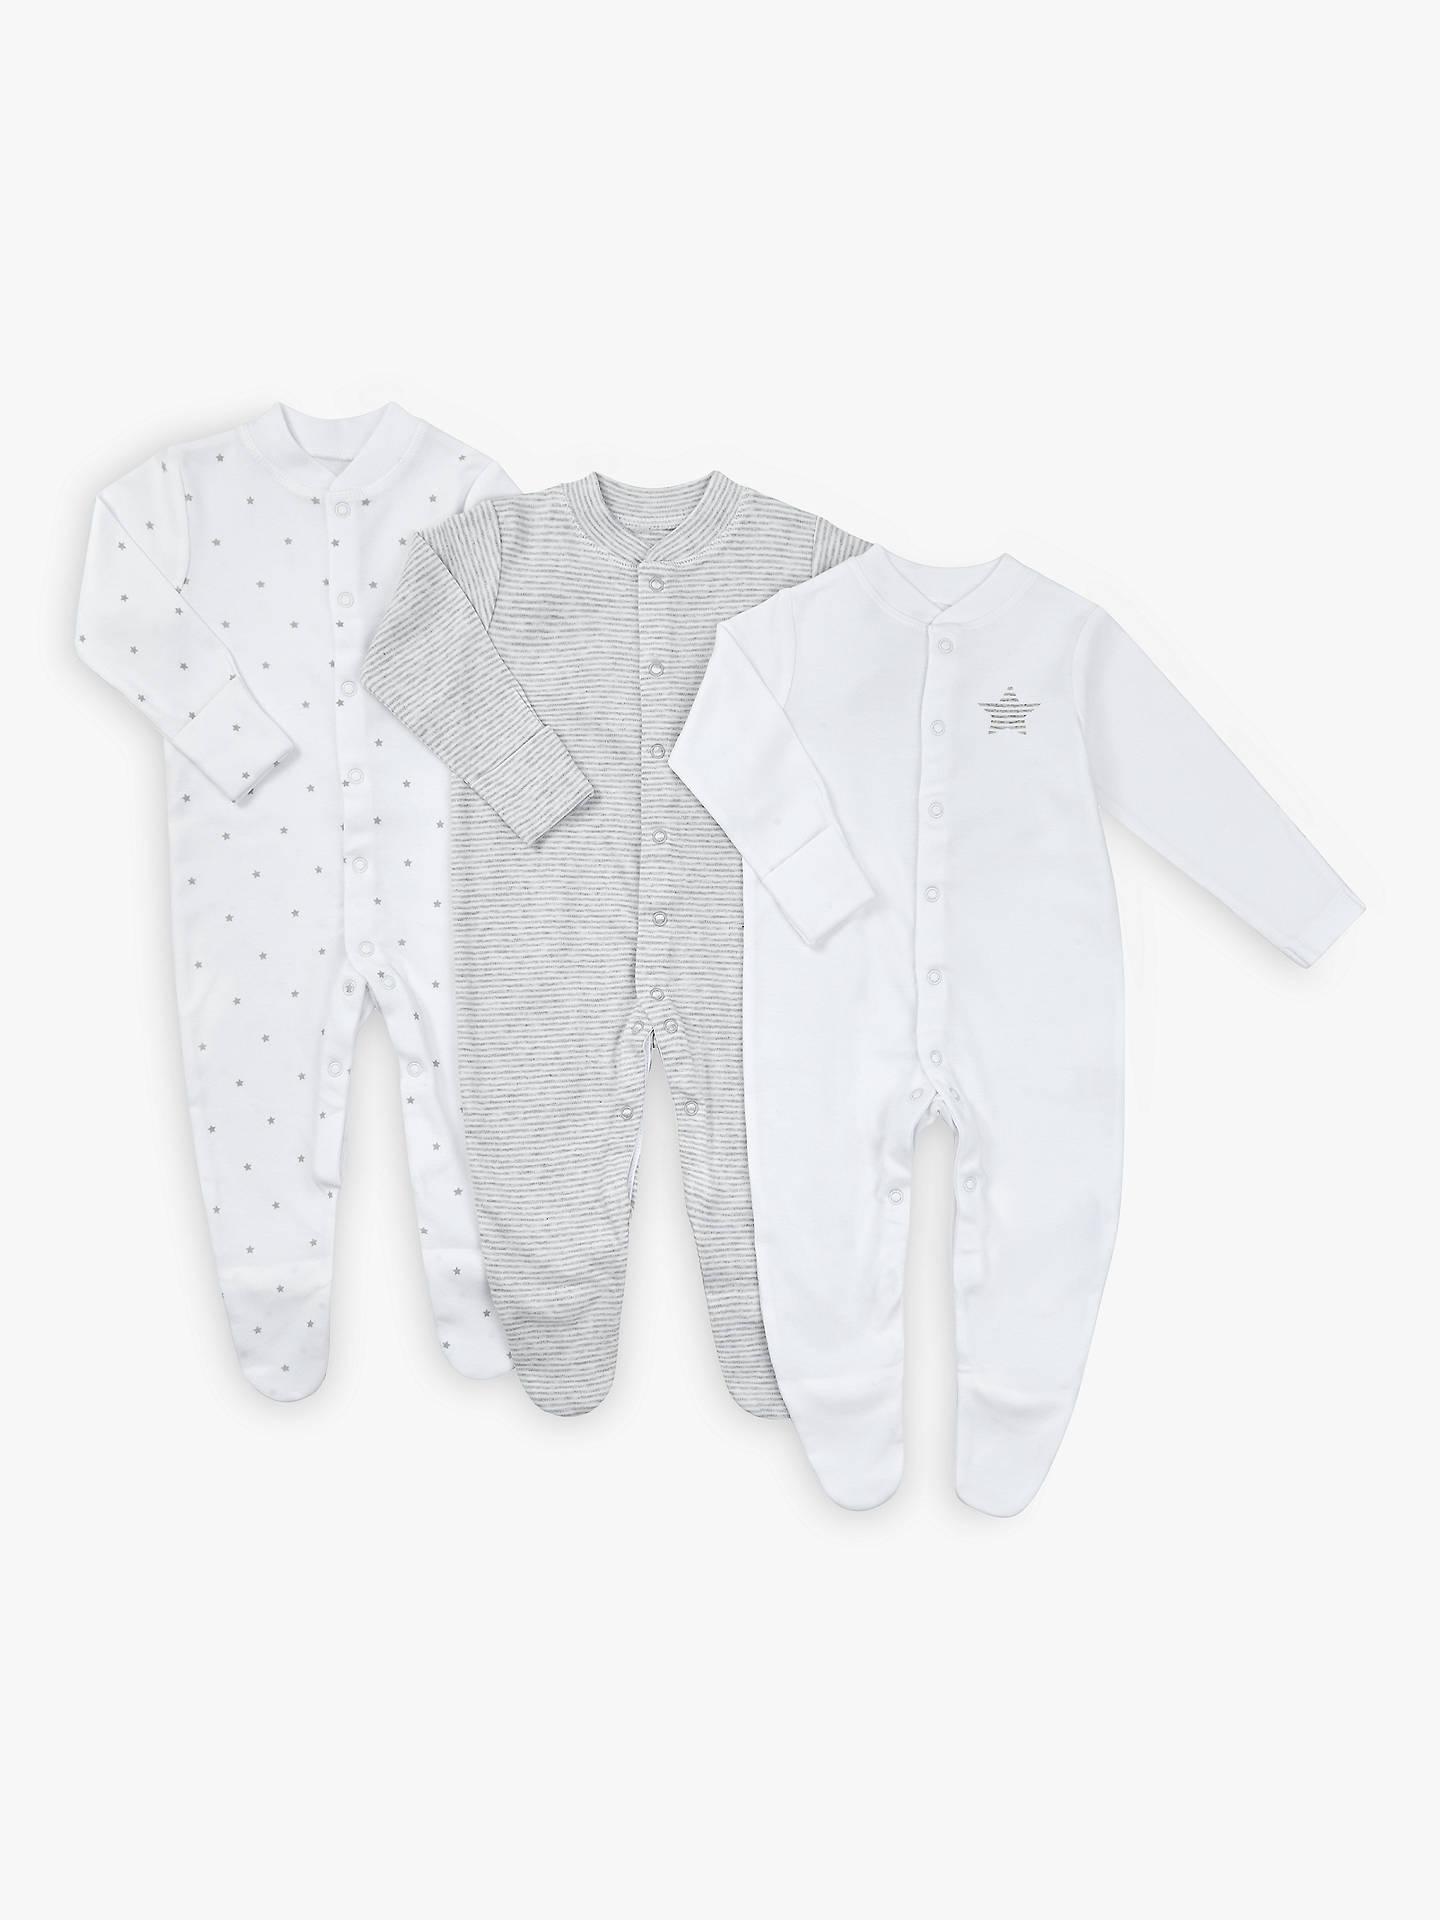 b63bbad5e Buy John Lewis & Partners Baby Stars Long Sleeve GOTS Organic Cotton  Sleepsuit, Pack of ...